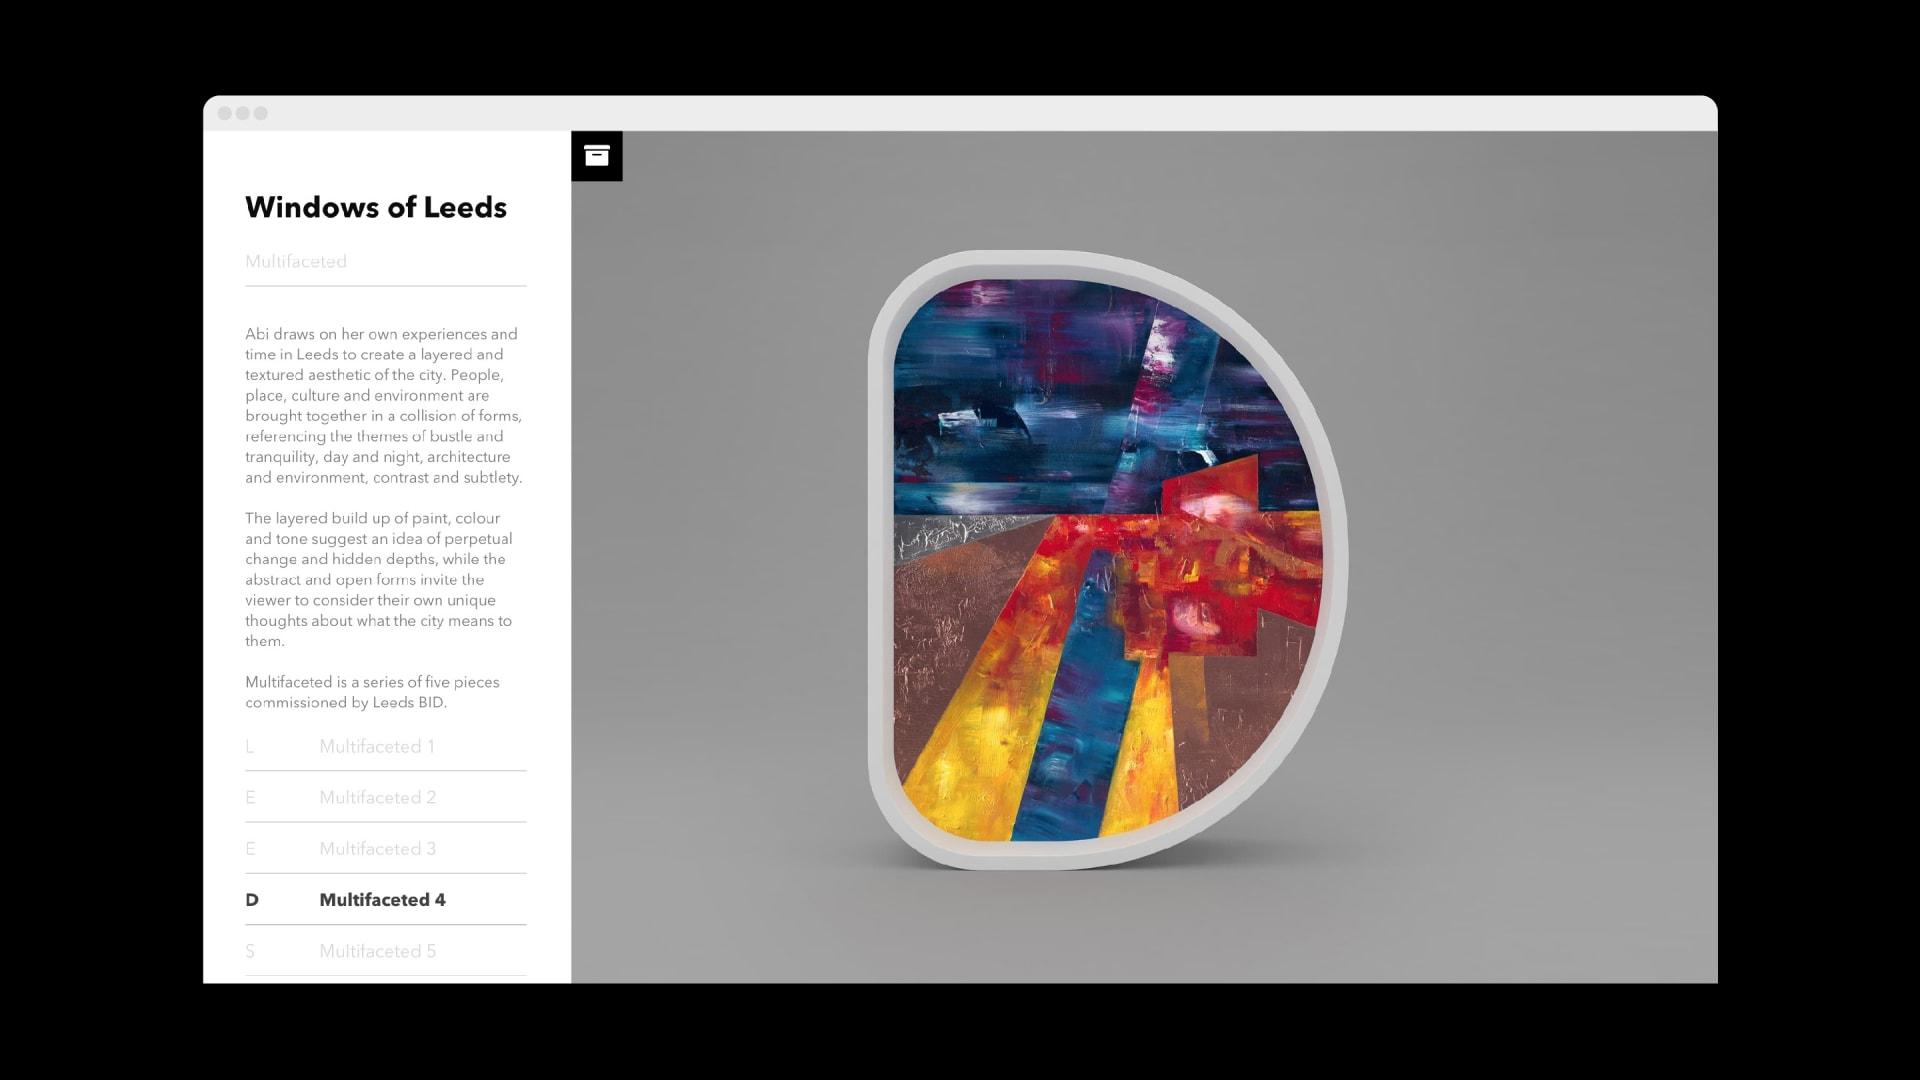 Windows of Leeds website archive: Abi Moffat comission